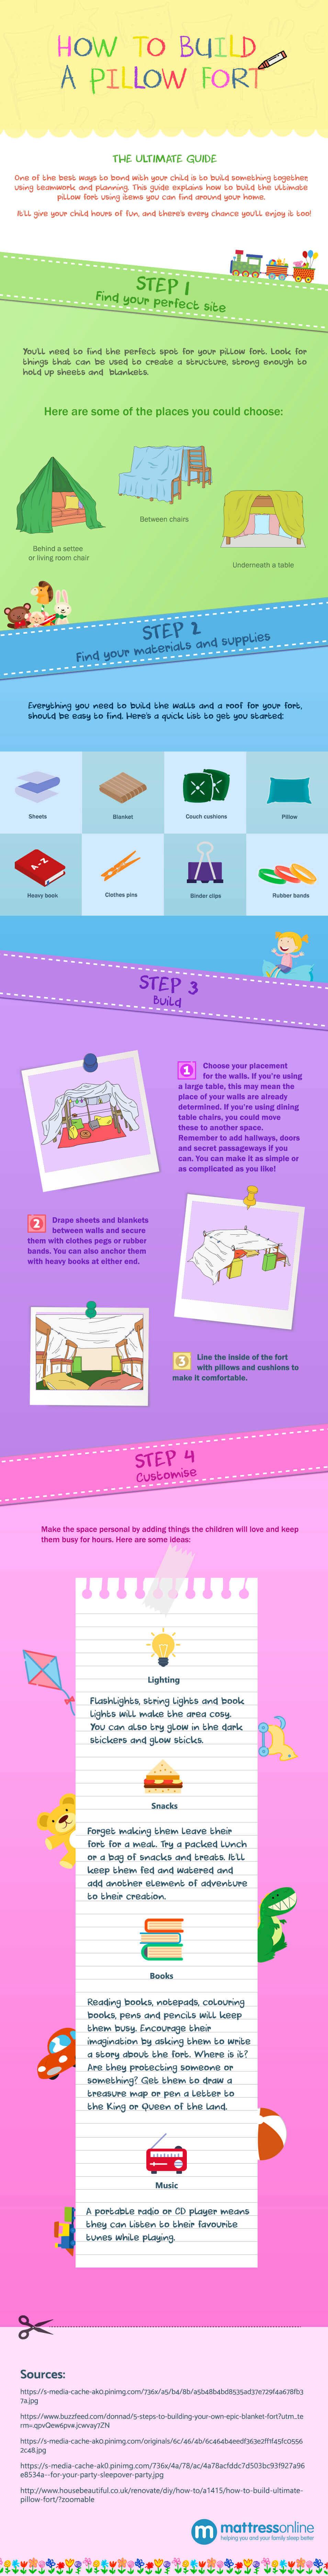 Pillowfort Infographic